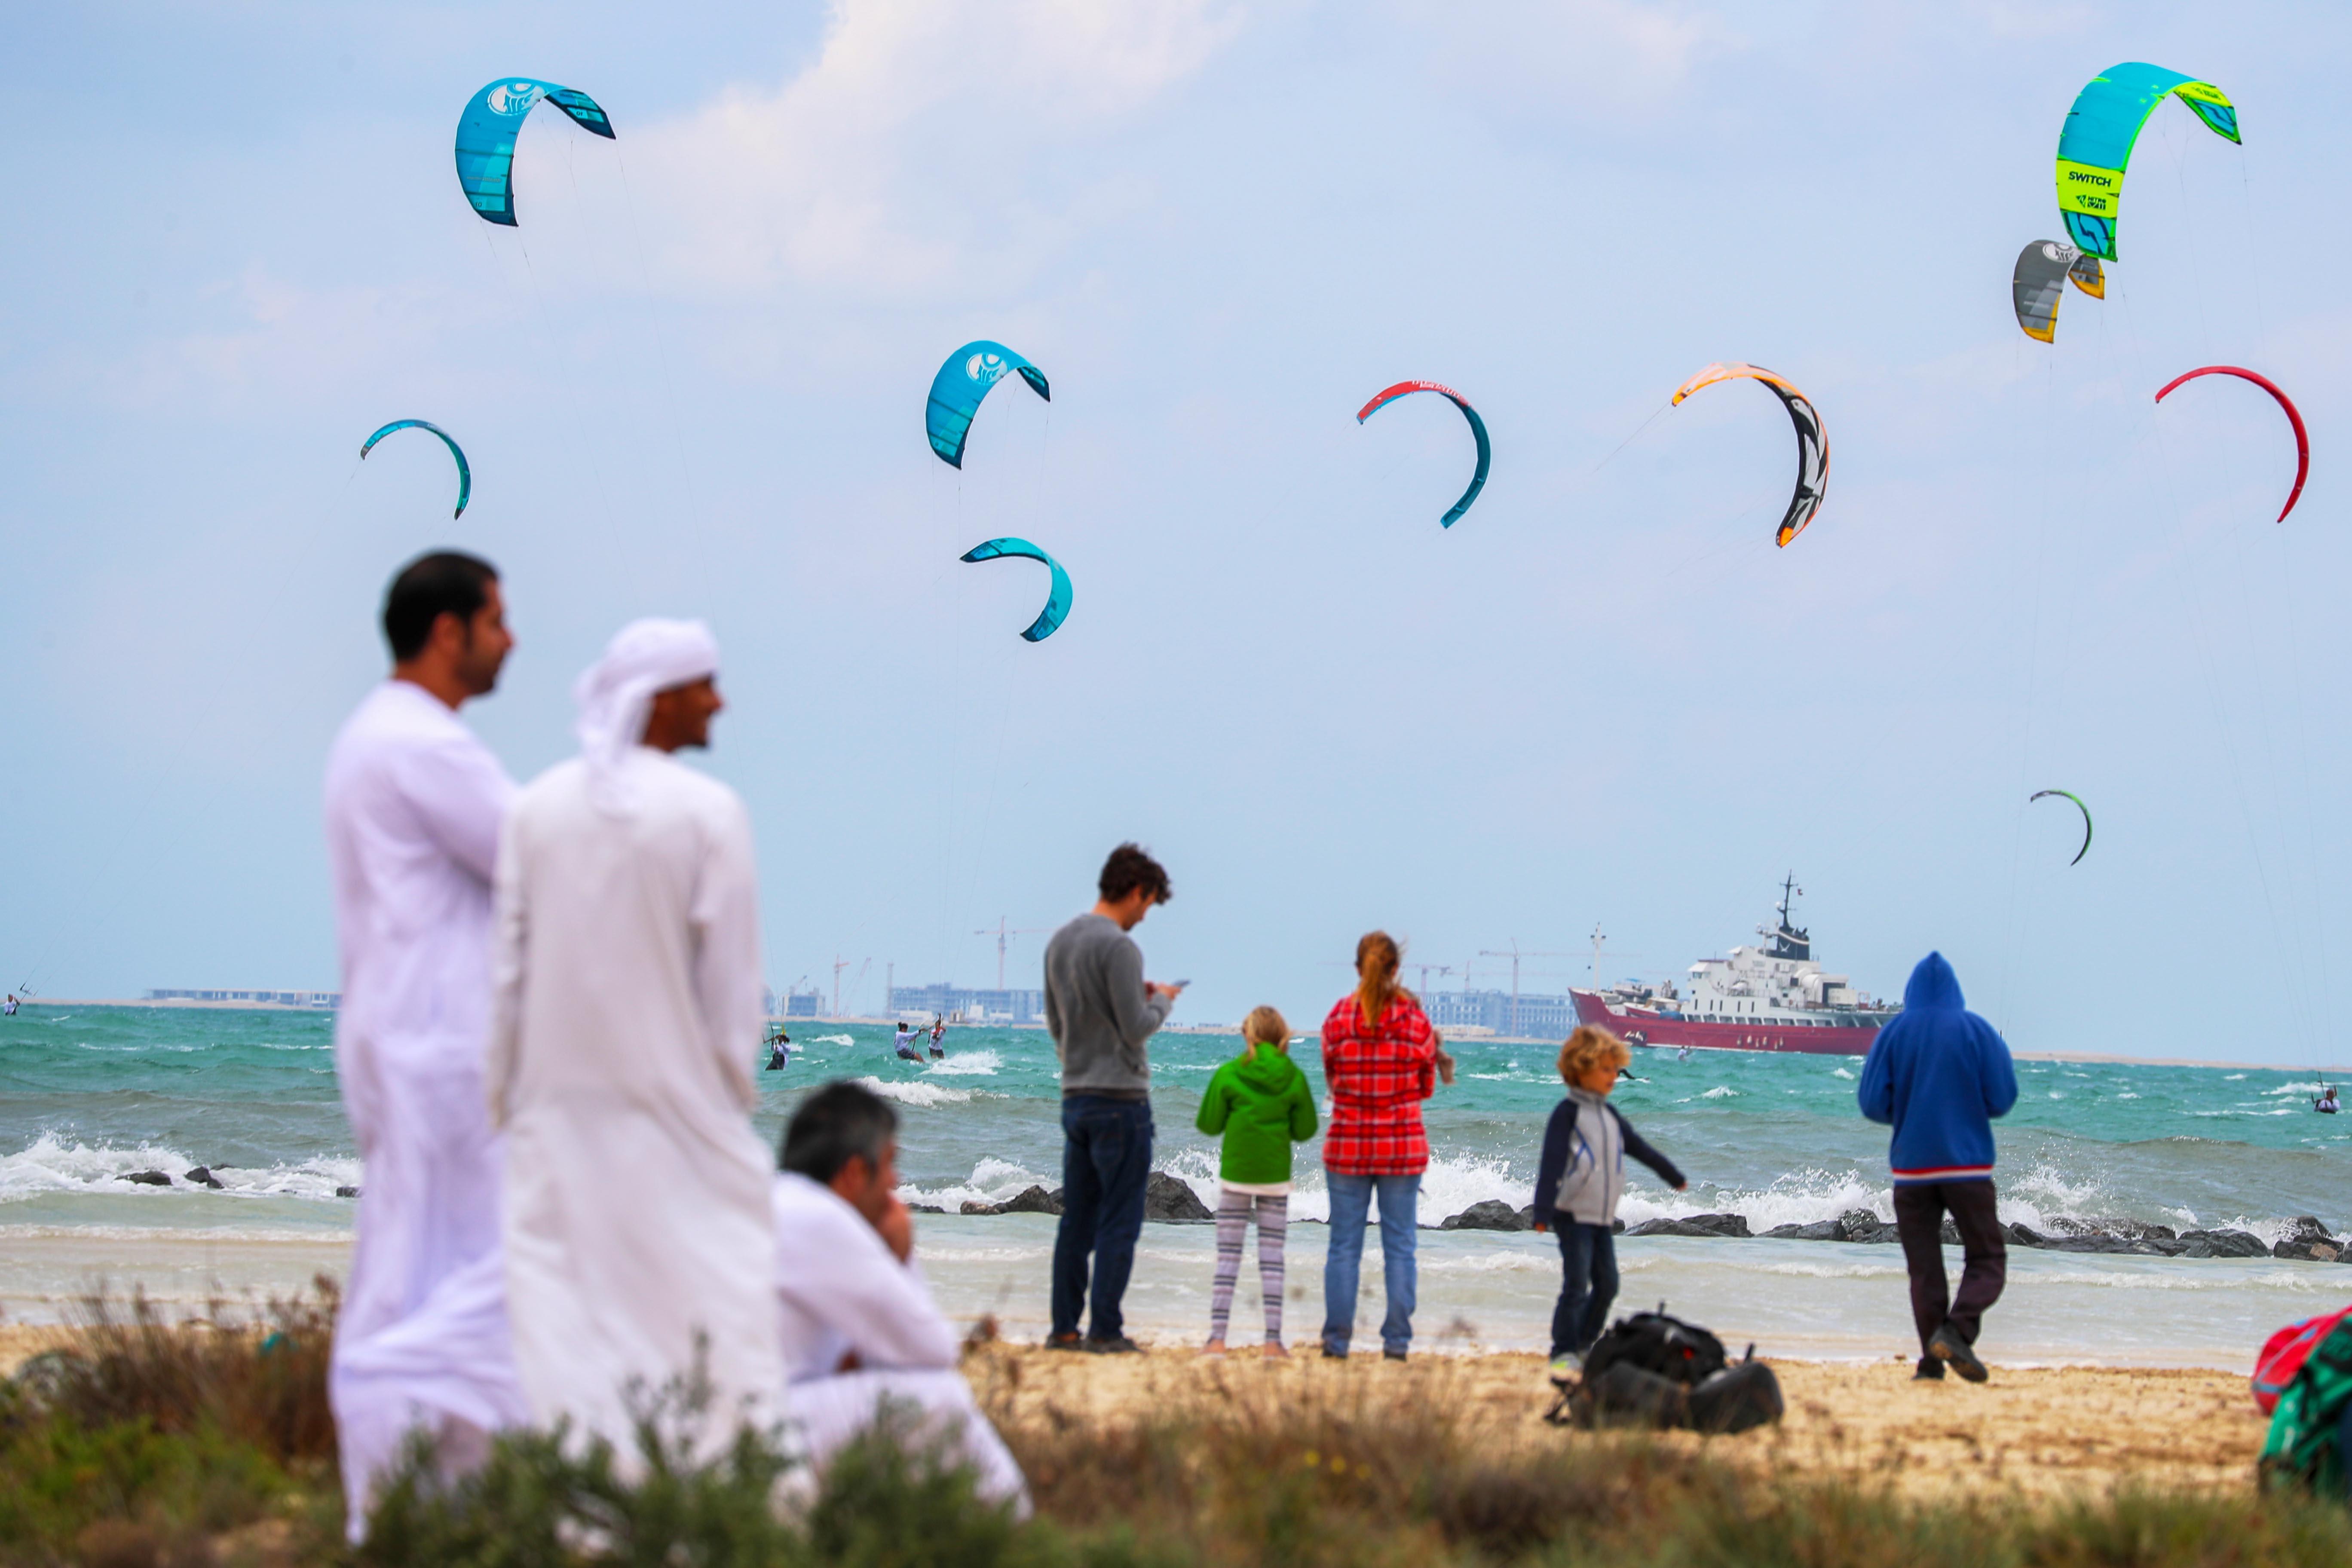 Dubai Kitesurf Open Ends Today